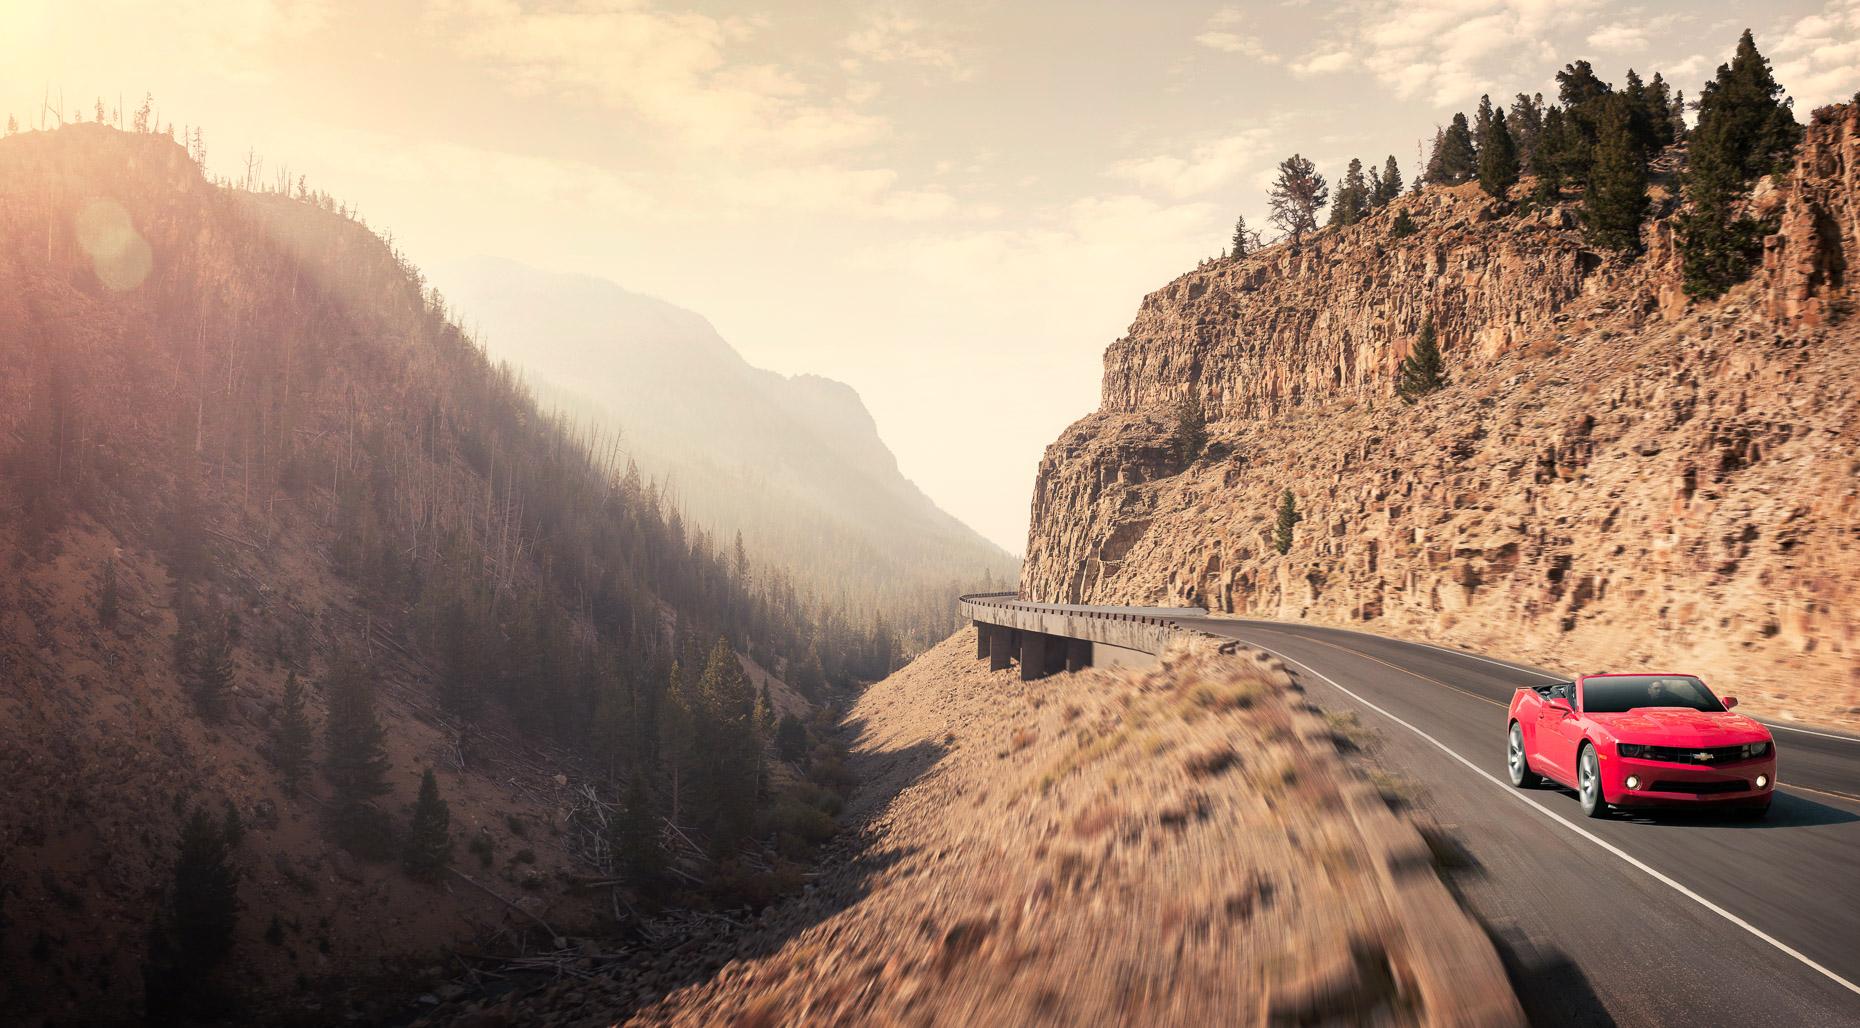 Yellowstone_FINAL_CAR.jpg